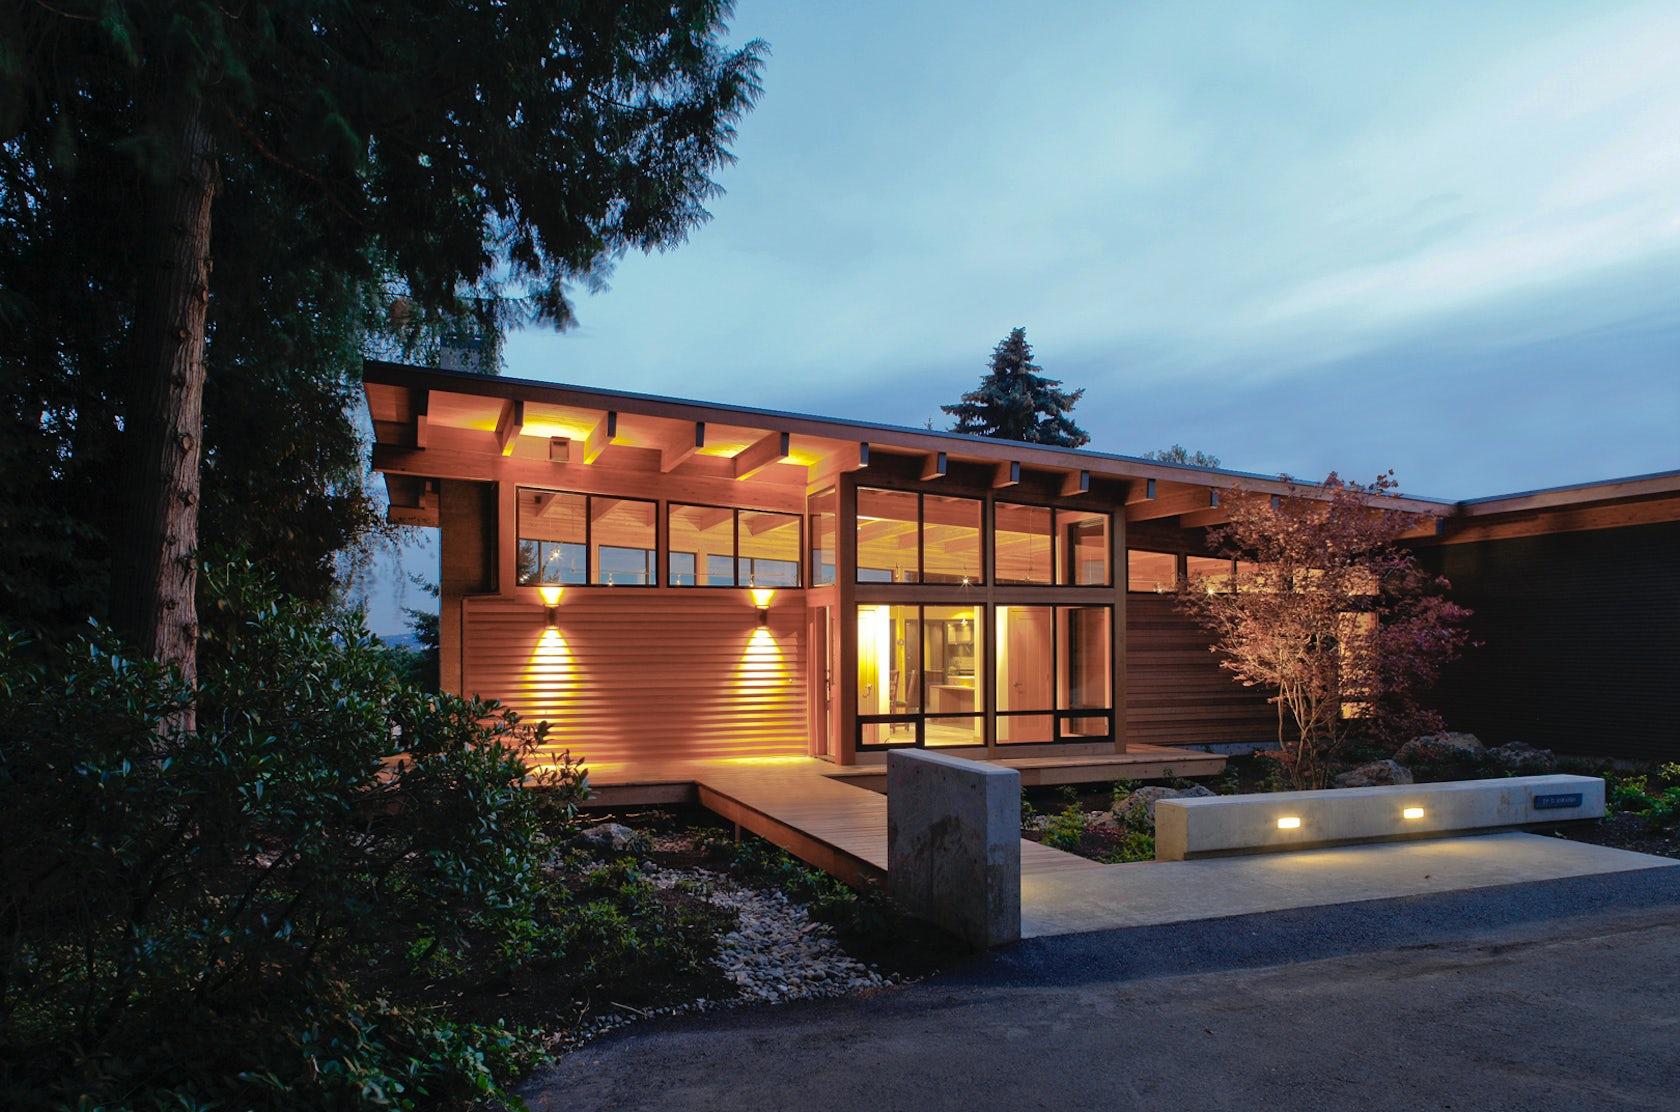 hotchkiss residence architizer. Black Bedroom Furniture Sets. Home Design Ideas